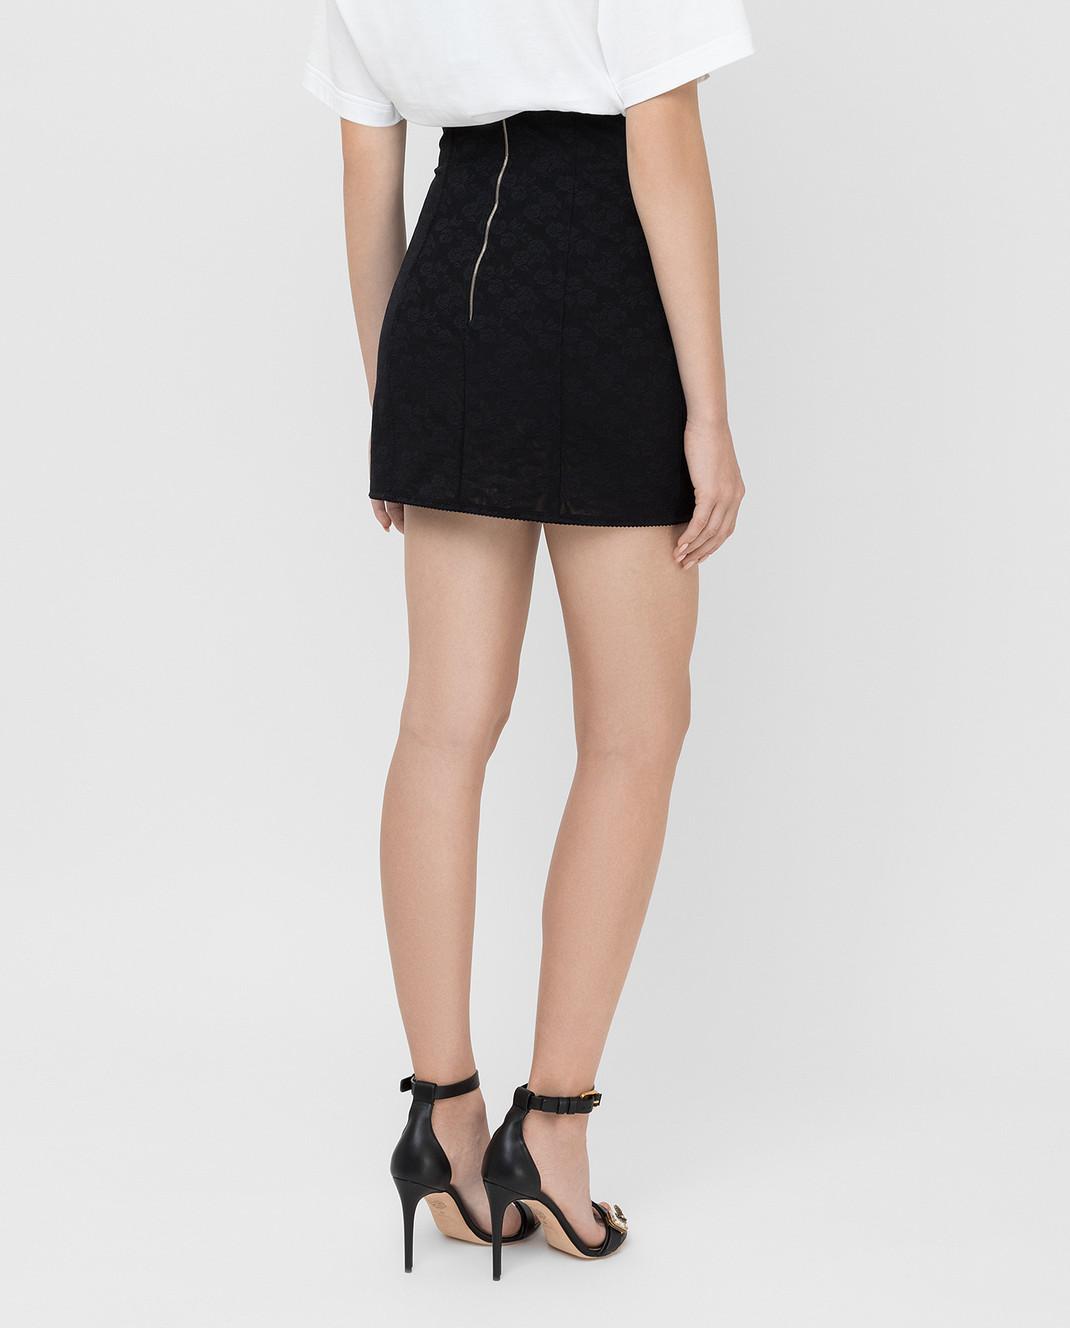 Dolce&Gabbana Черная юбка изображение 4